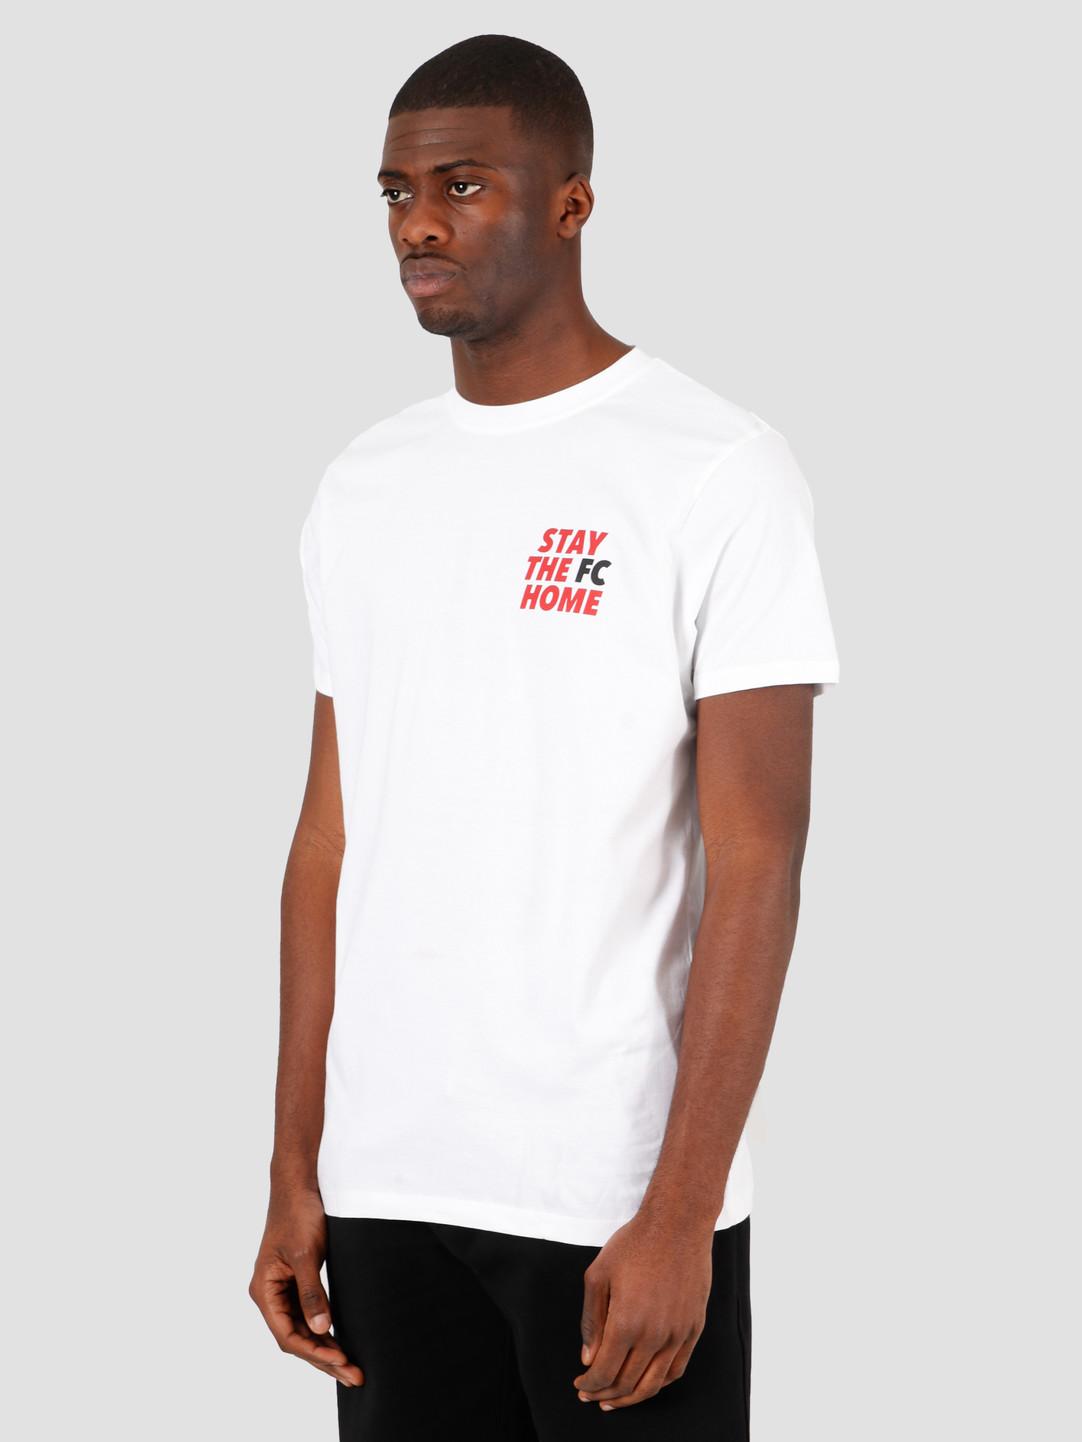 FRESHCOTTON FreshCotton Stay The FC Home T-Shirt White